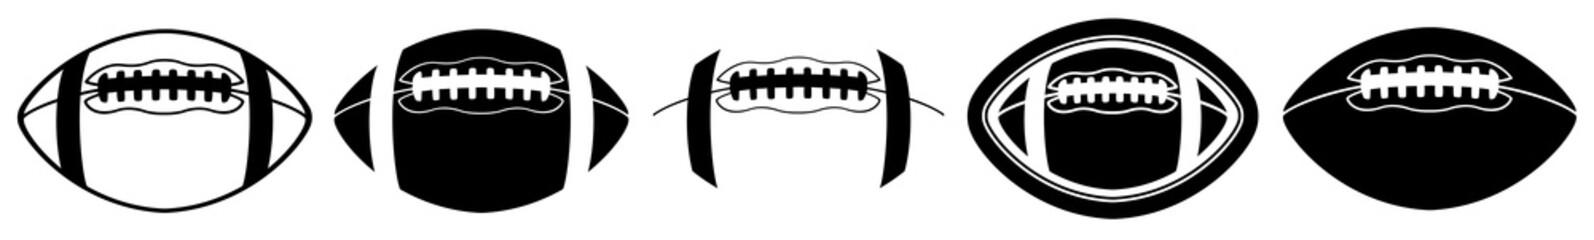 American Football | Ball | Emblem | Logo | Variations Fototapete